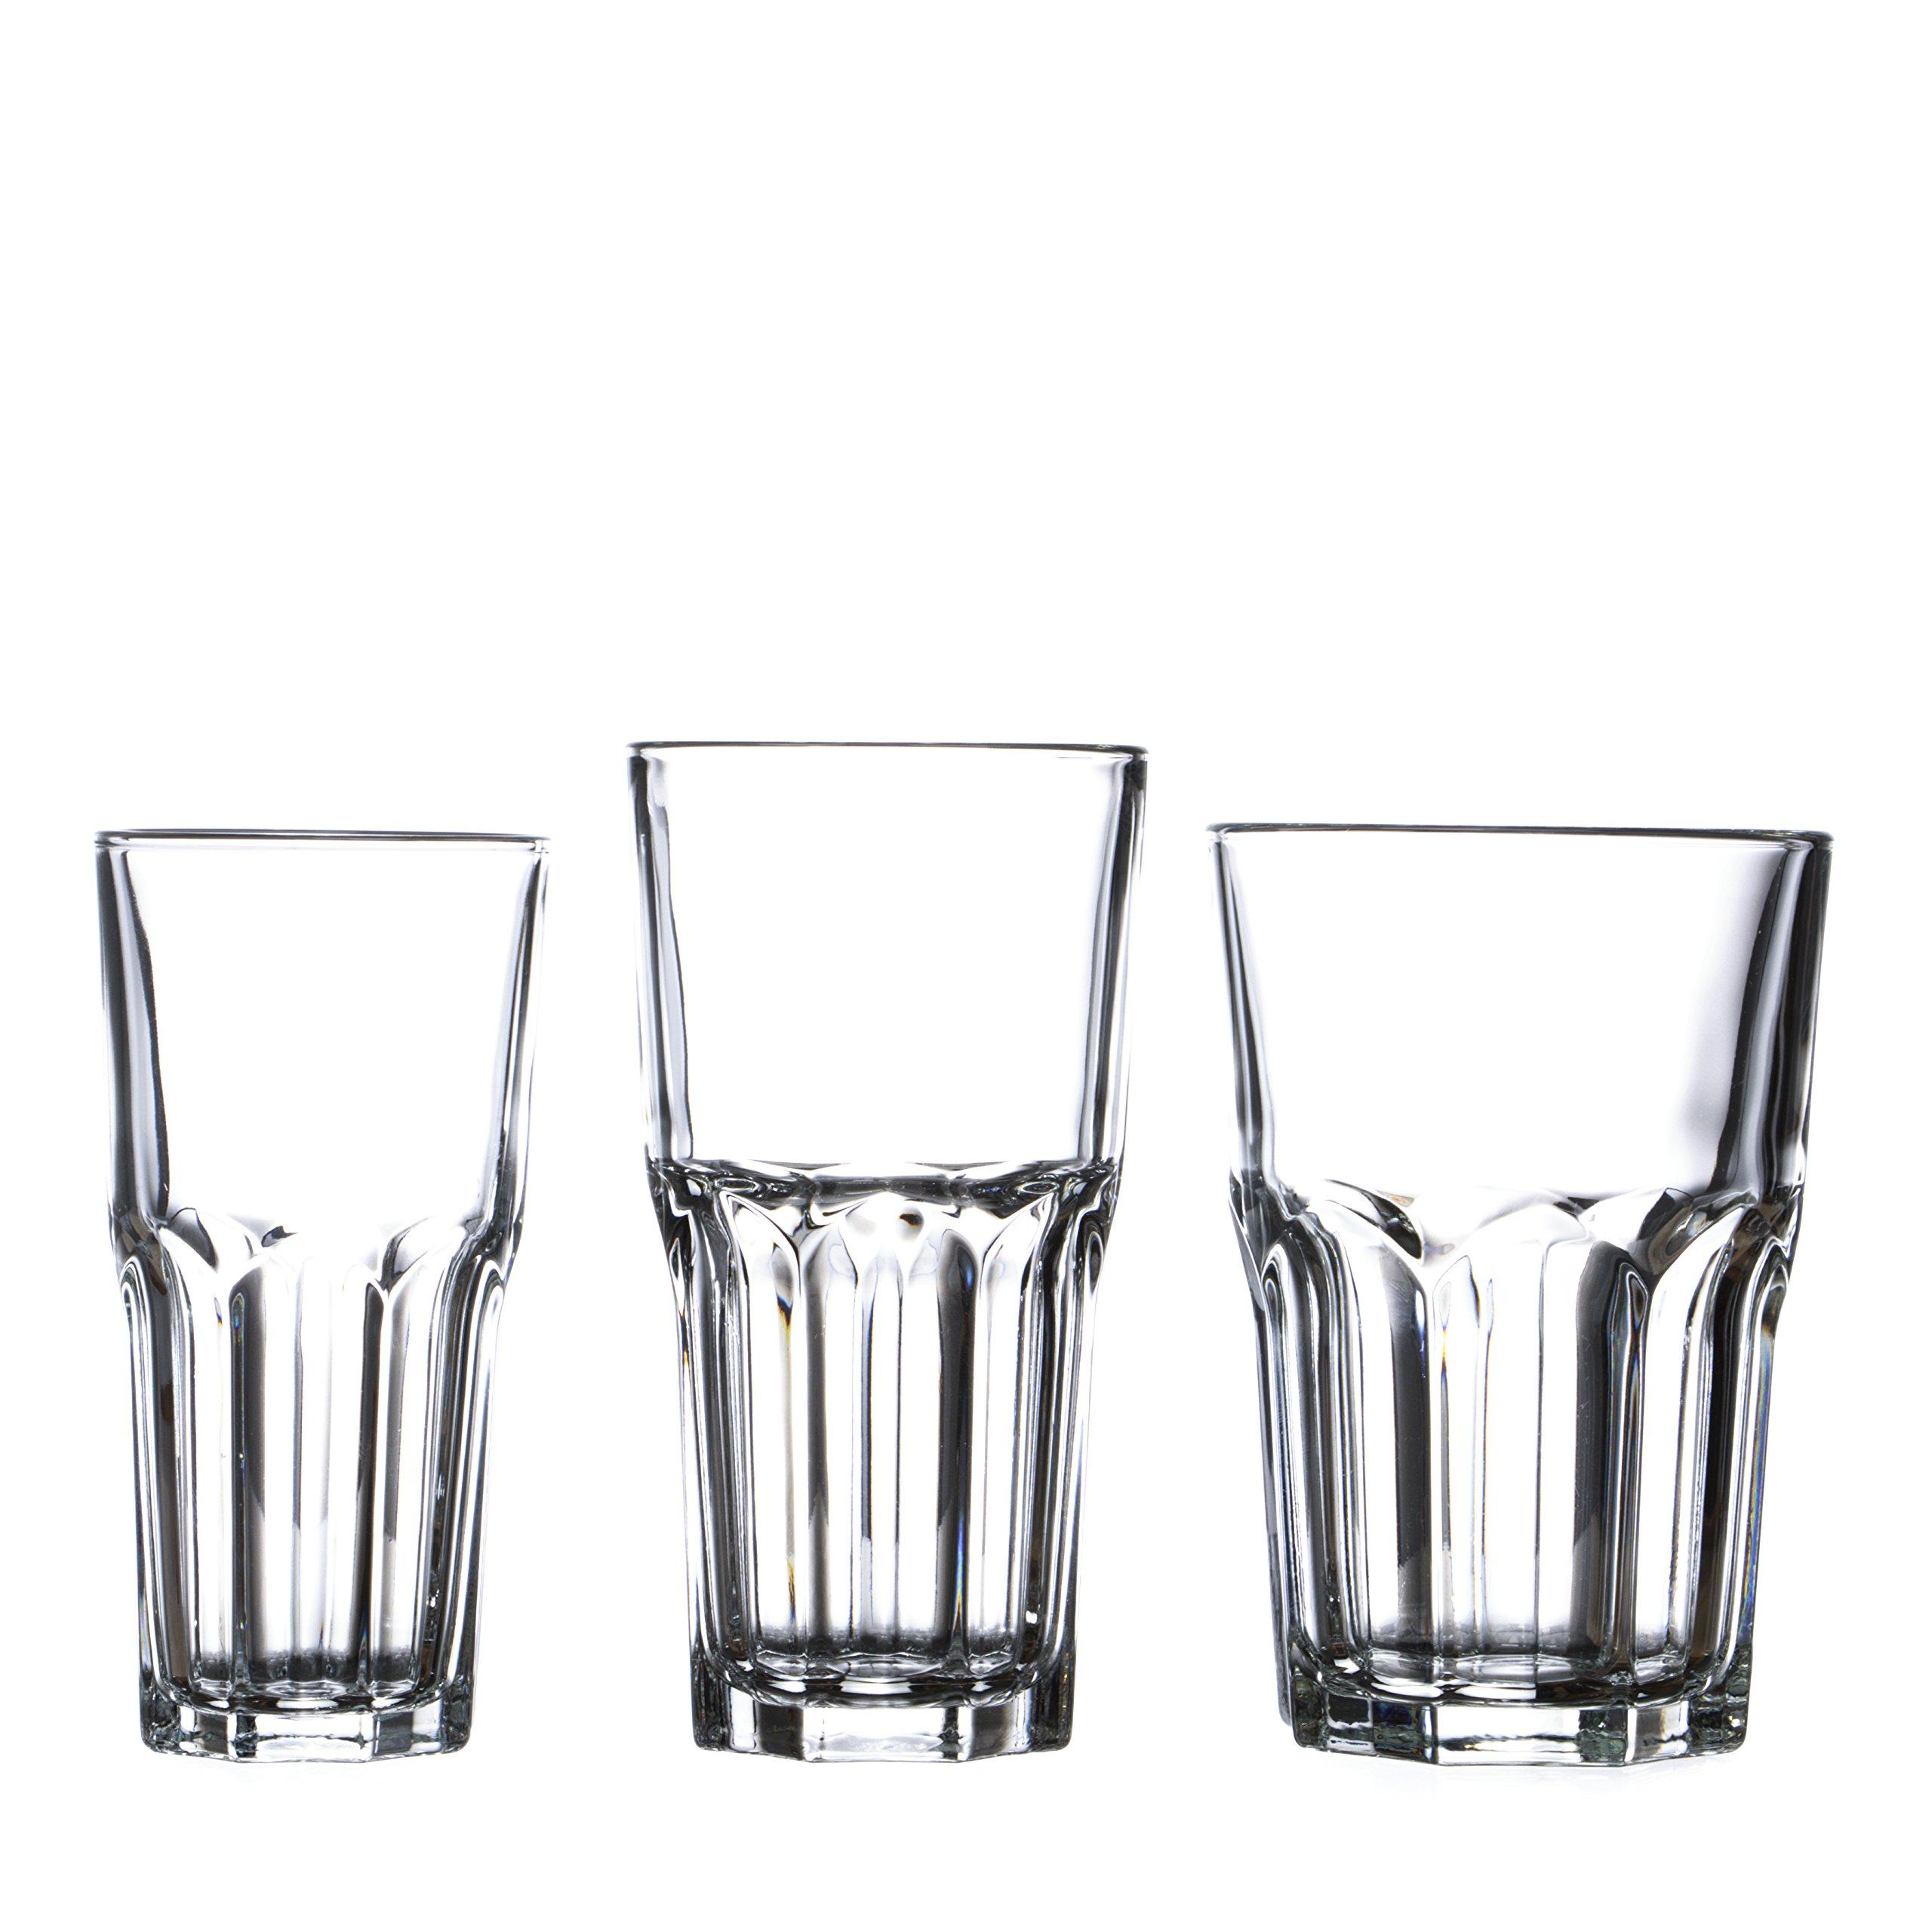 ARCOROC GRANITY Water/Beverage Highball Glasses Set, 12 Oz (24)